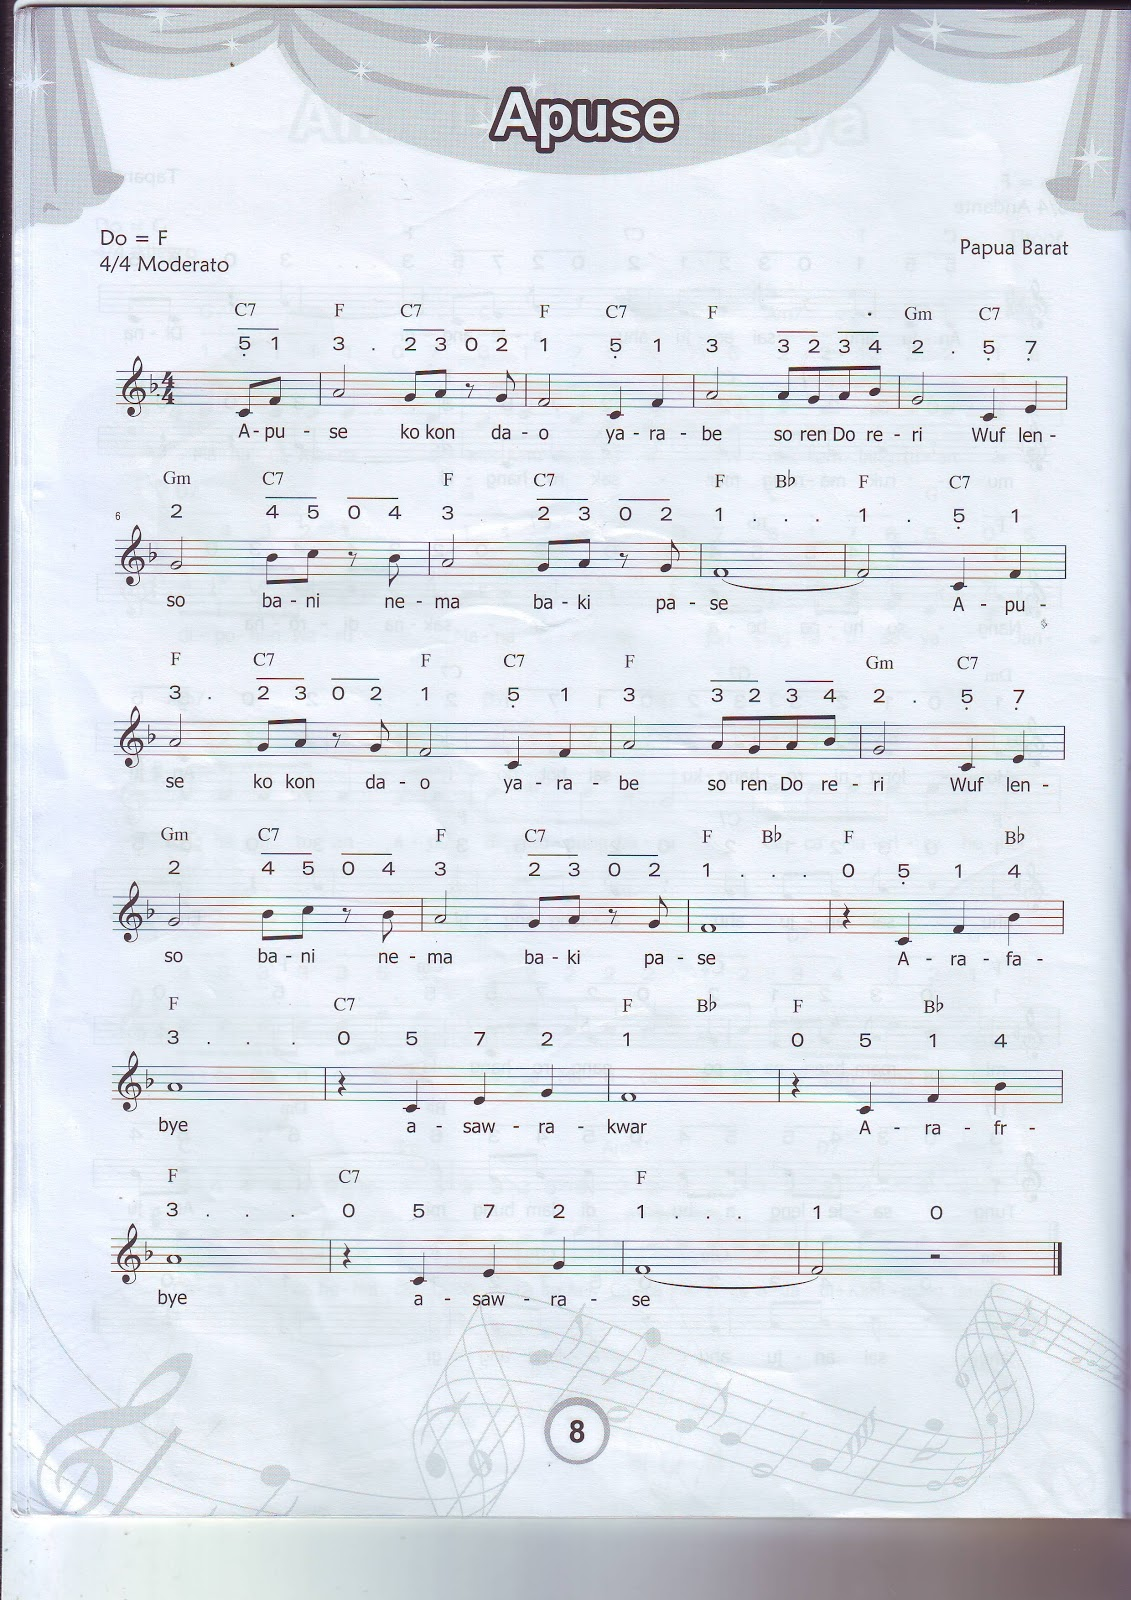 Sebutkan Beberapa Lagu Daerah Yang Anda Ketahui : sebutkan, beberapa, daerah, ketahui, Sebutkan, Daerah, Beserta, Asalnya